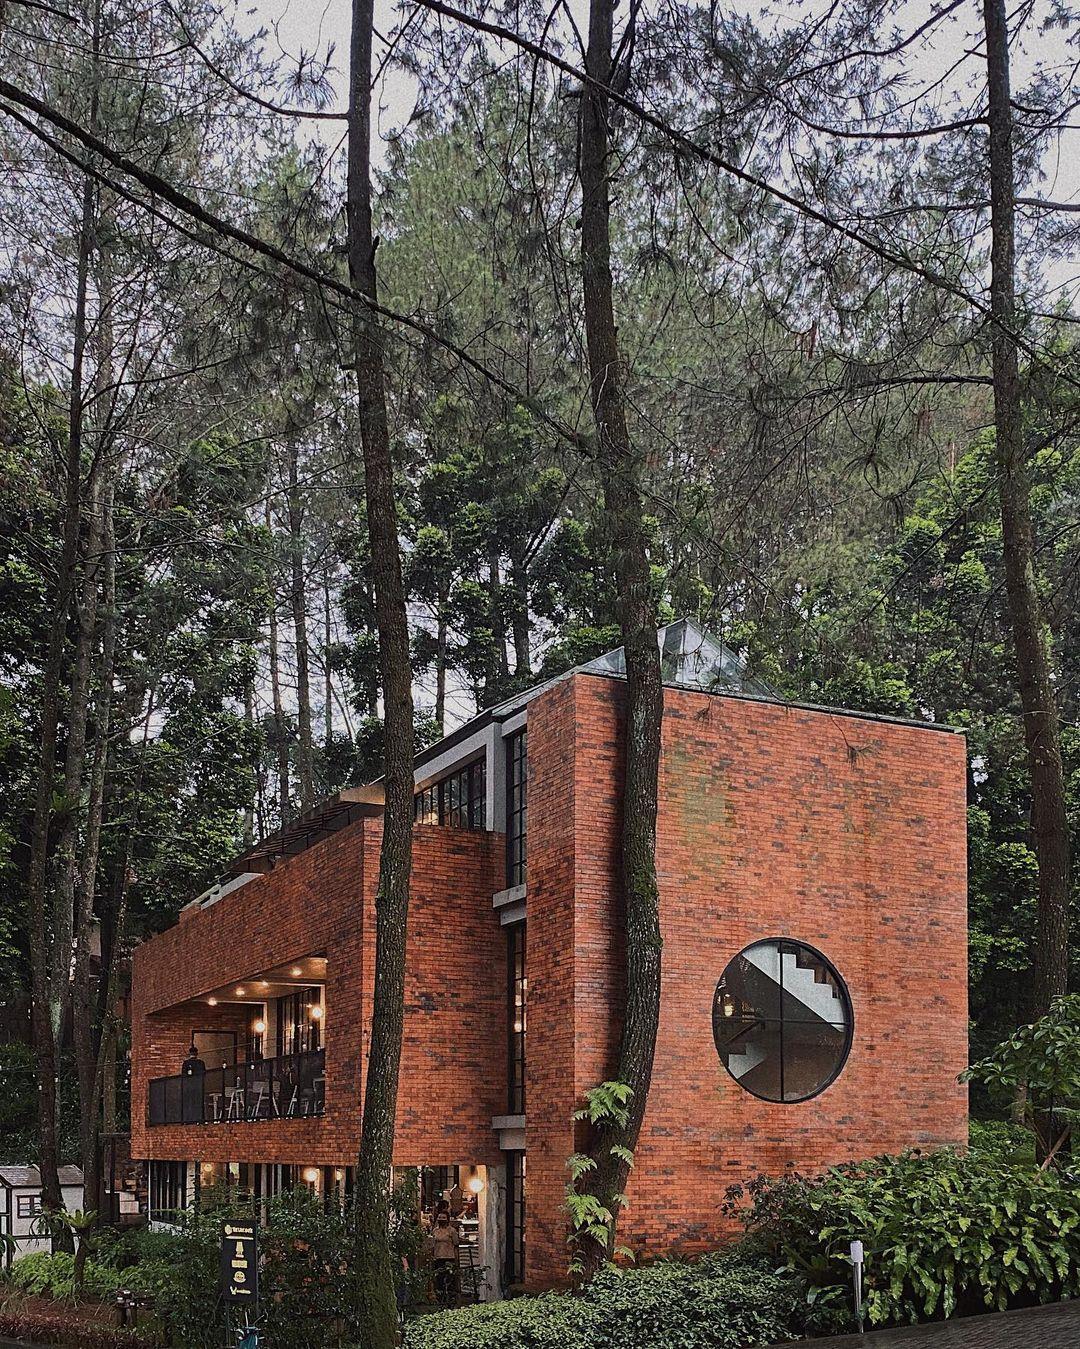 Bagian Samping The Lake House Bogor Image From @anditwndap